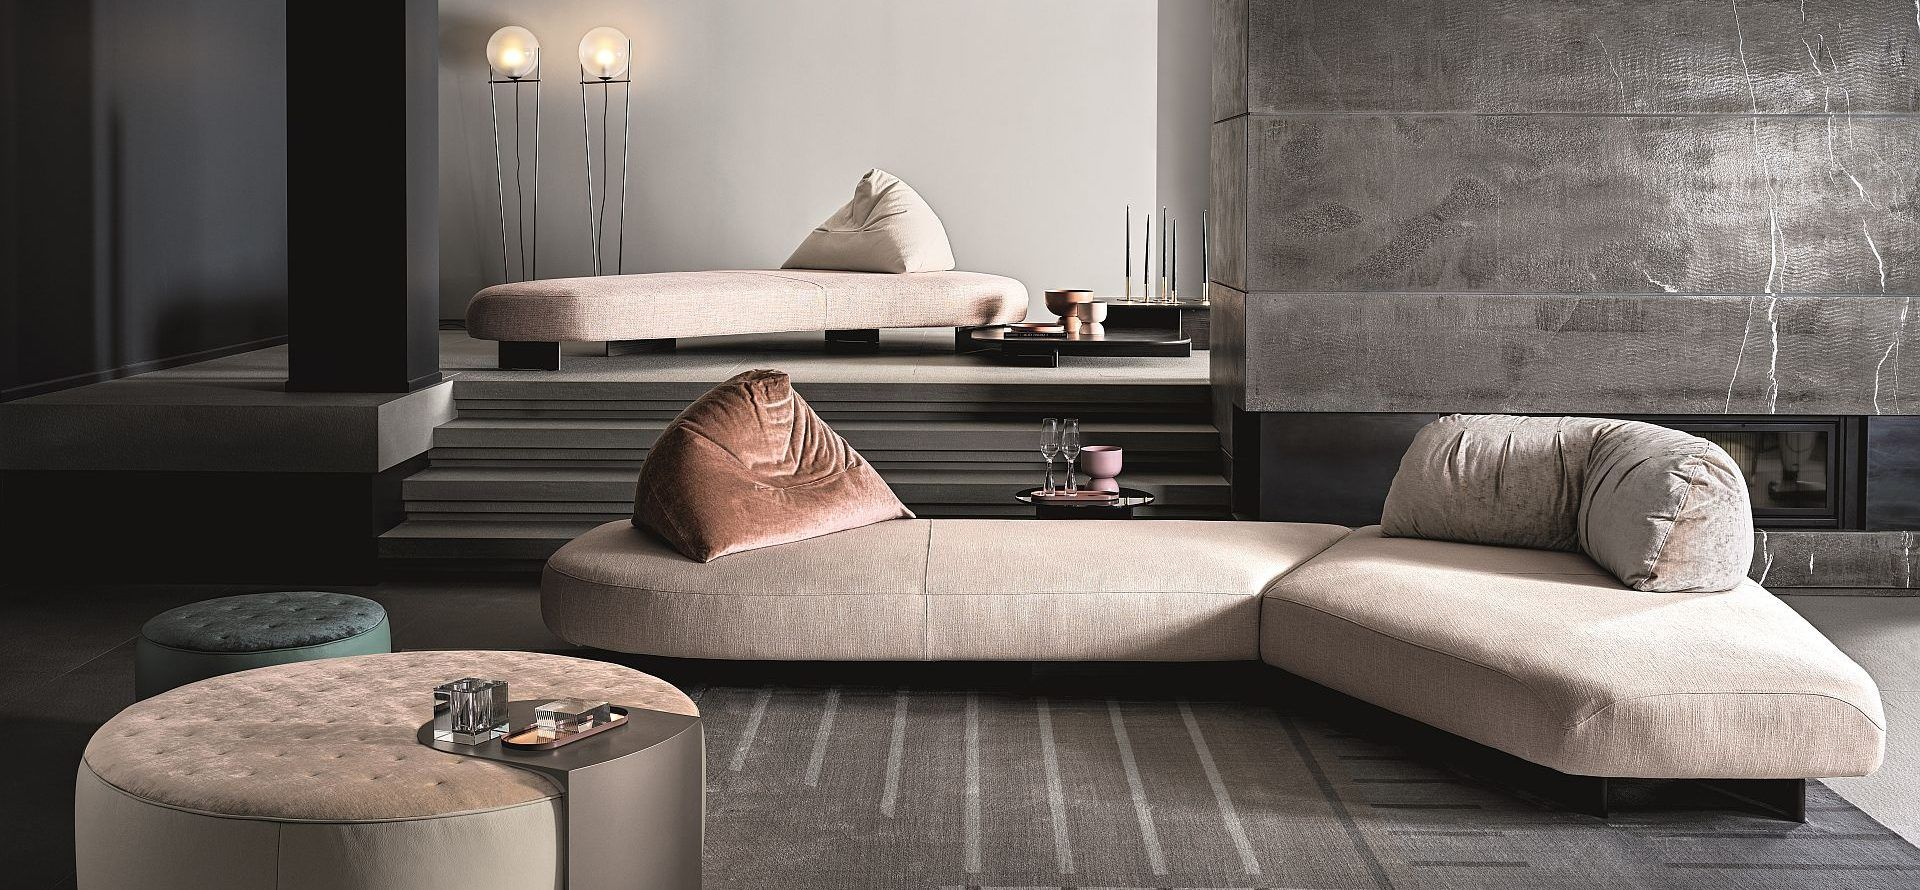 Papilo Ditre Italia In 2020 Italian Leather Sofa Luxury Italian Furniture Italian Furniture Brands